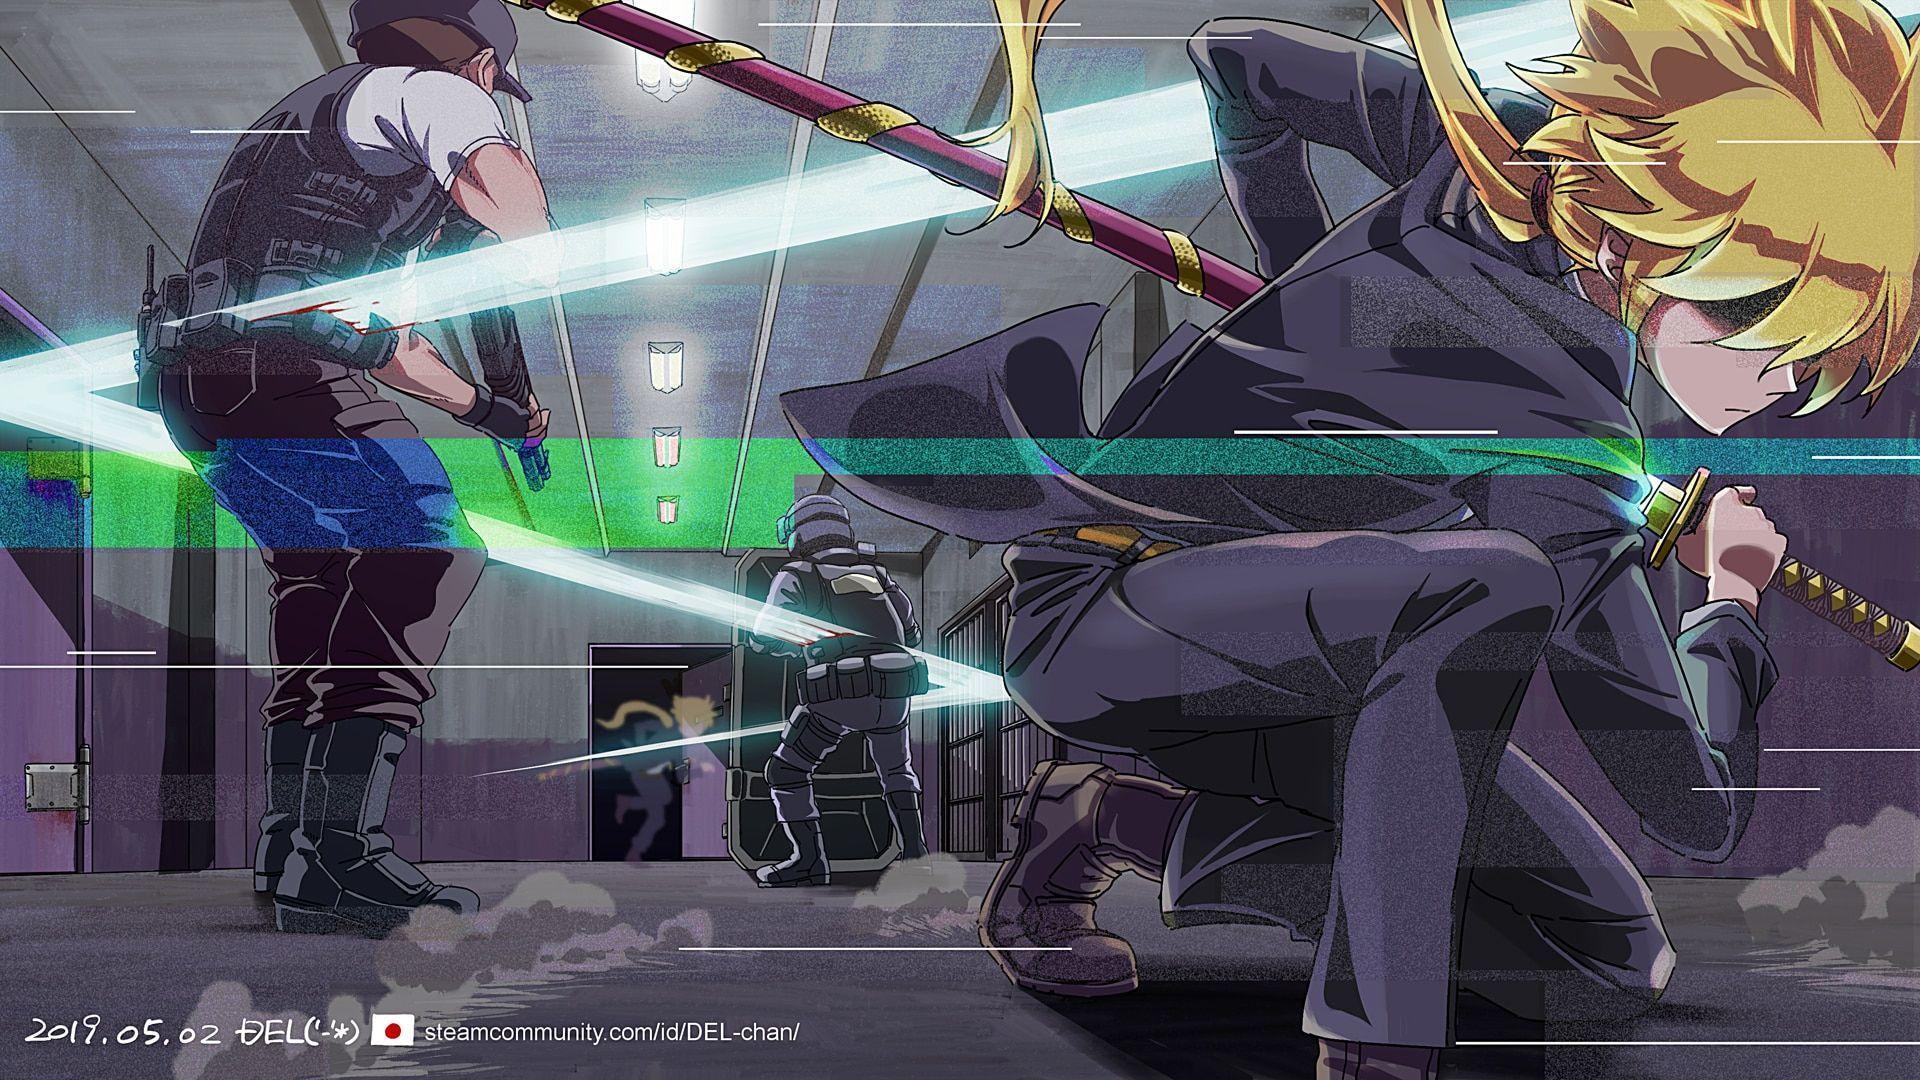 Katana Zero Wallpapers - Top Free Katana Zero Backgrounds ...